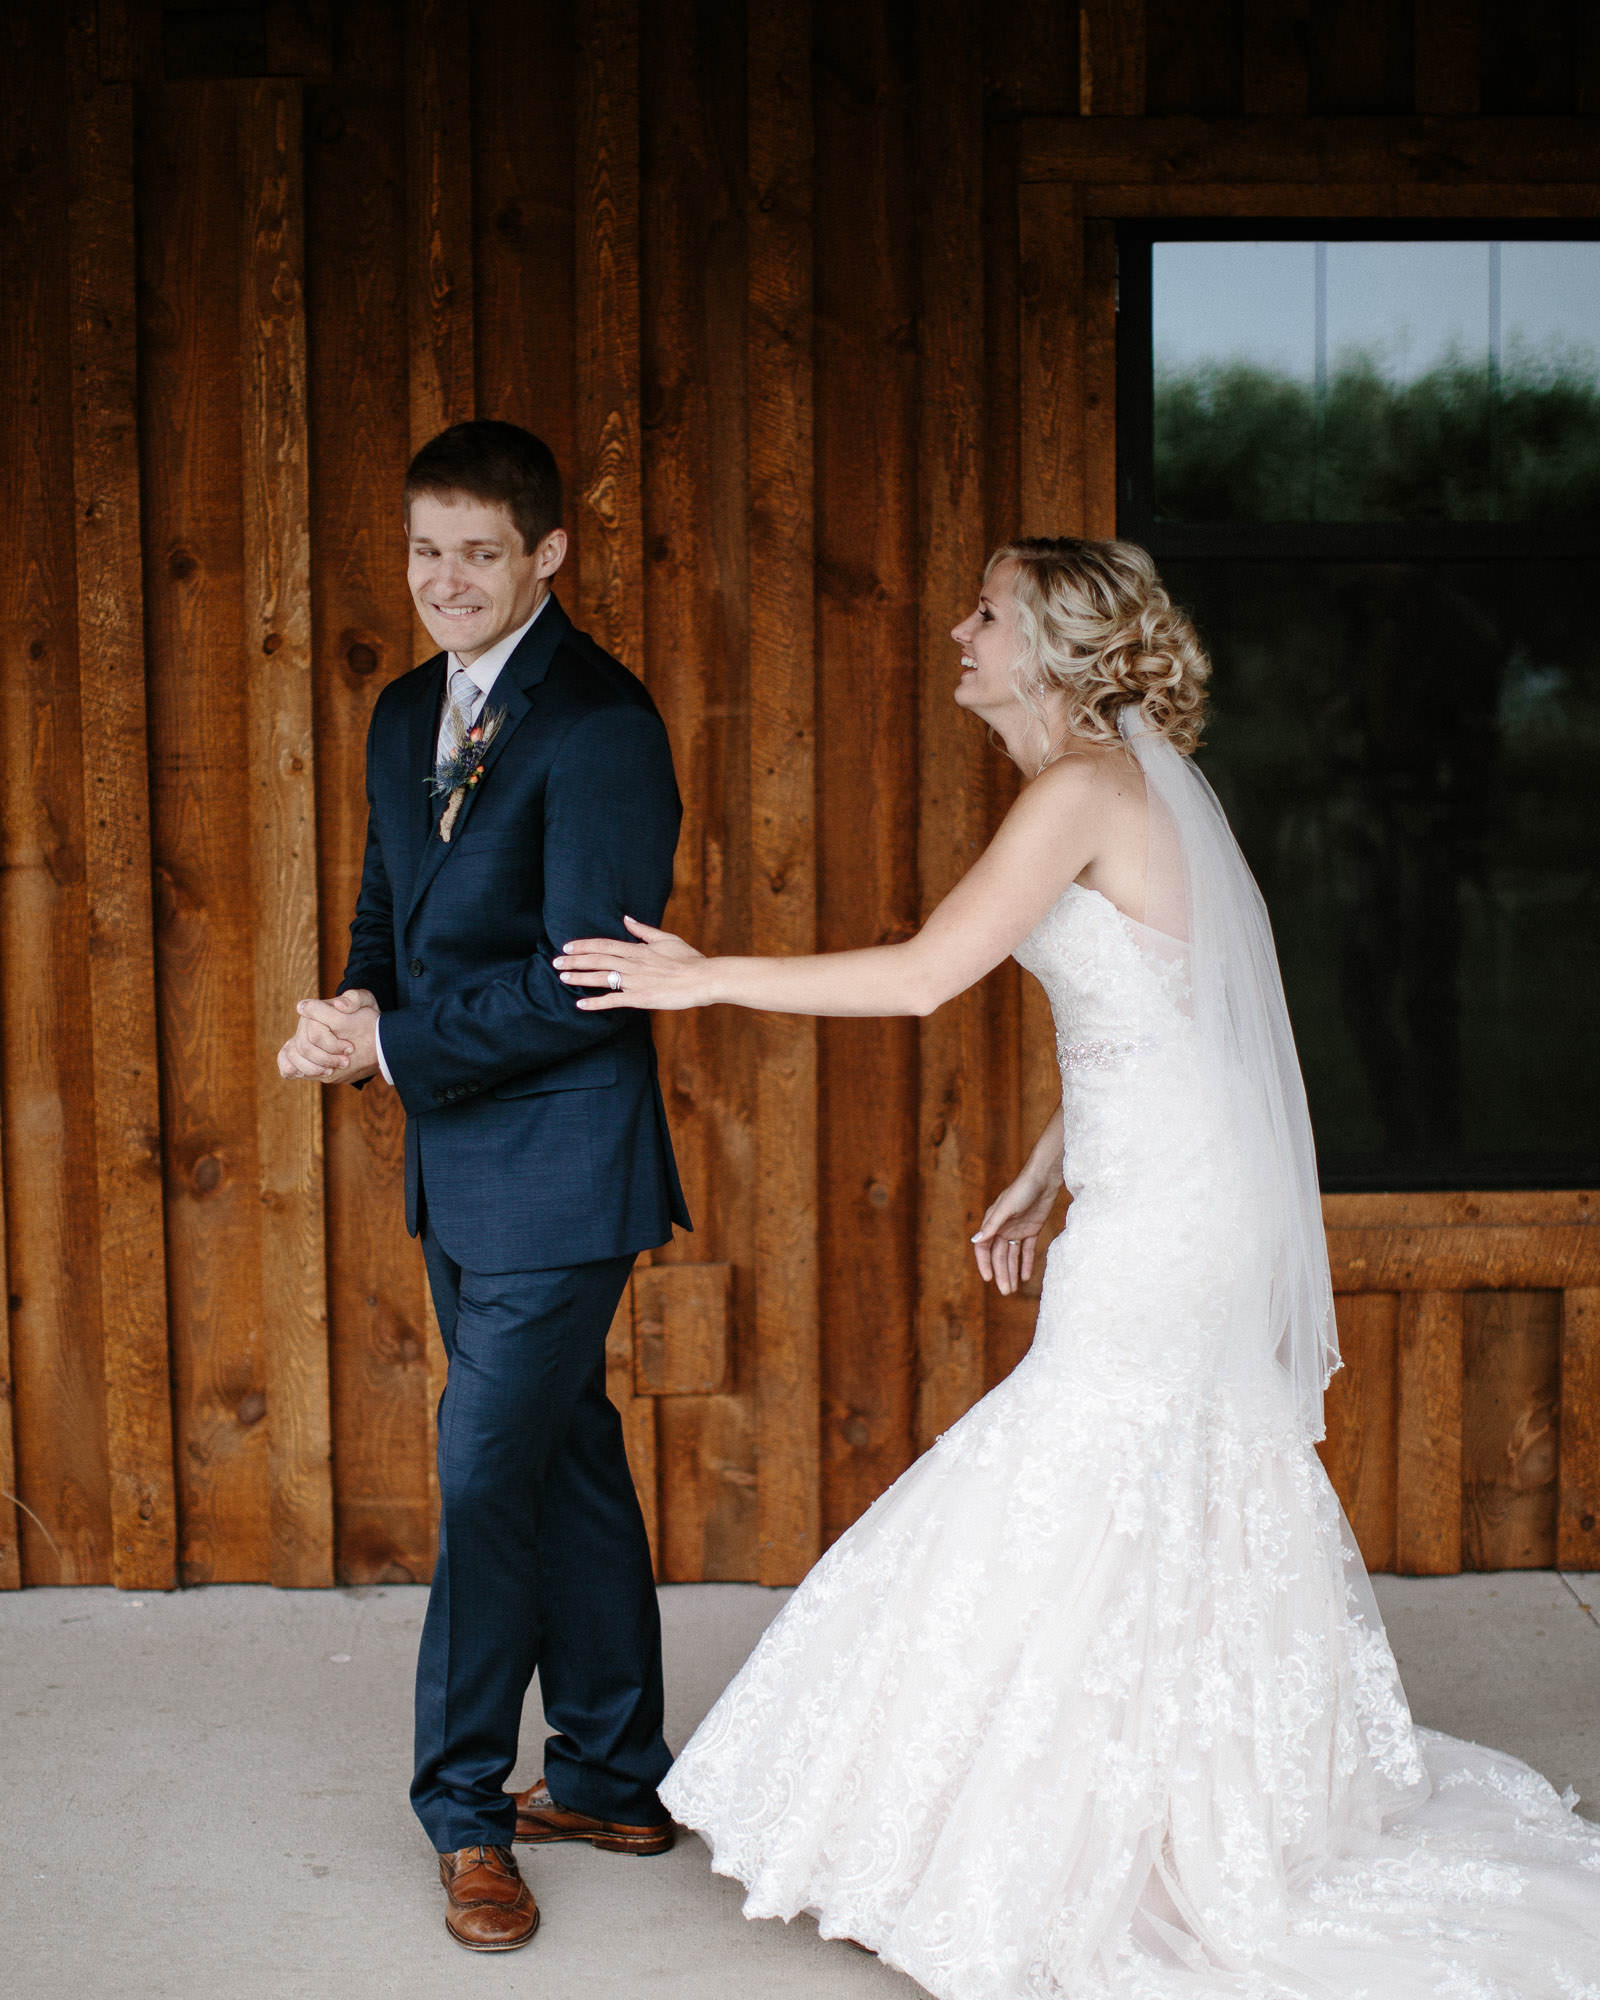 meadow-barn-wedding-sioux-falls-south-dakota-romantic-adventerous-michael-liedtke-photography020.jpg